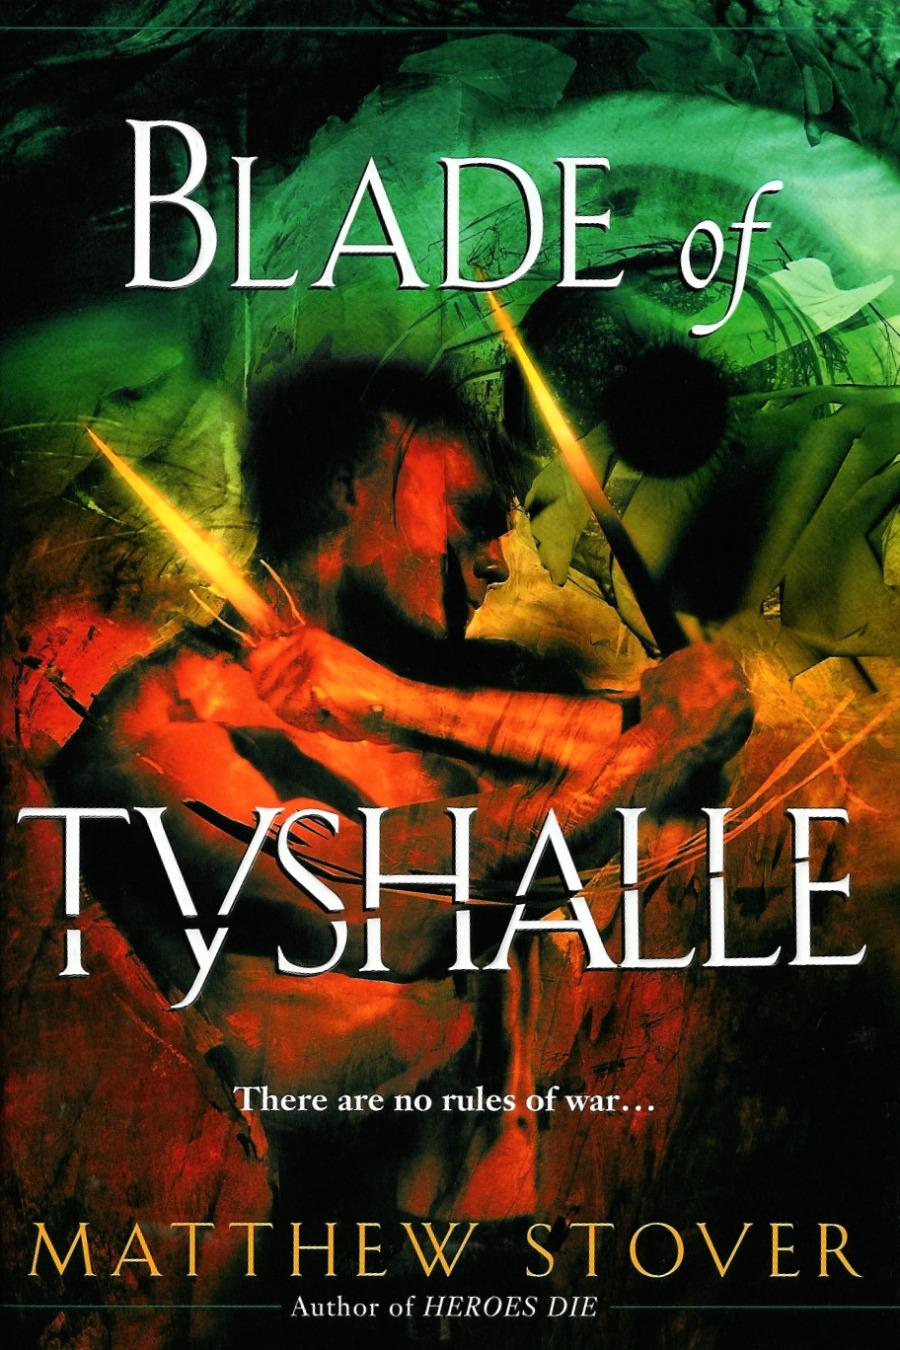 blade-of-tyshalle-cover3.jpg